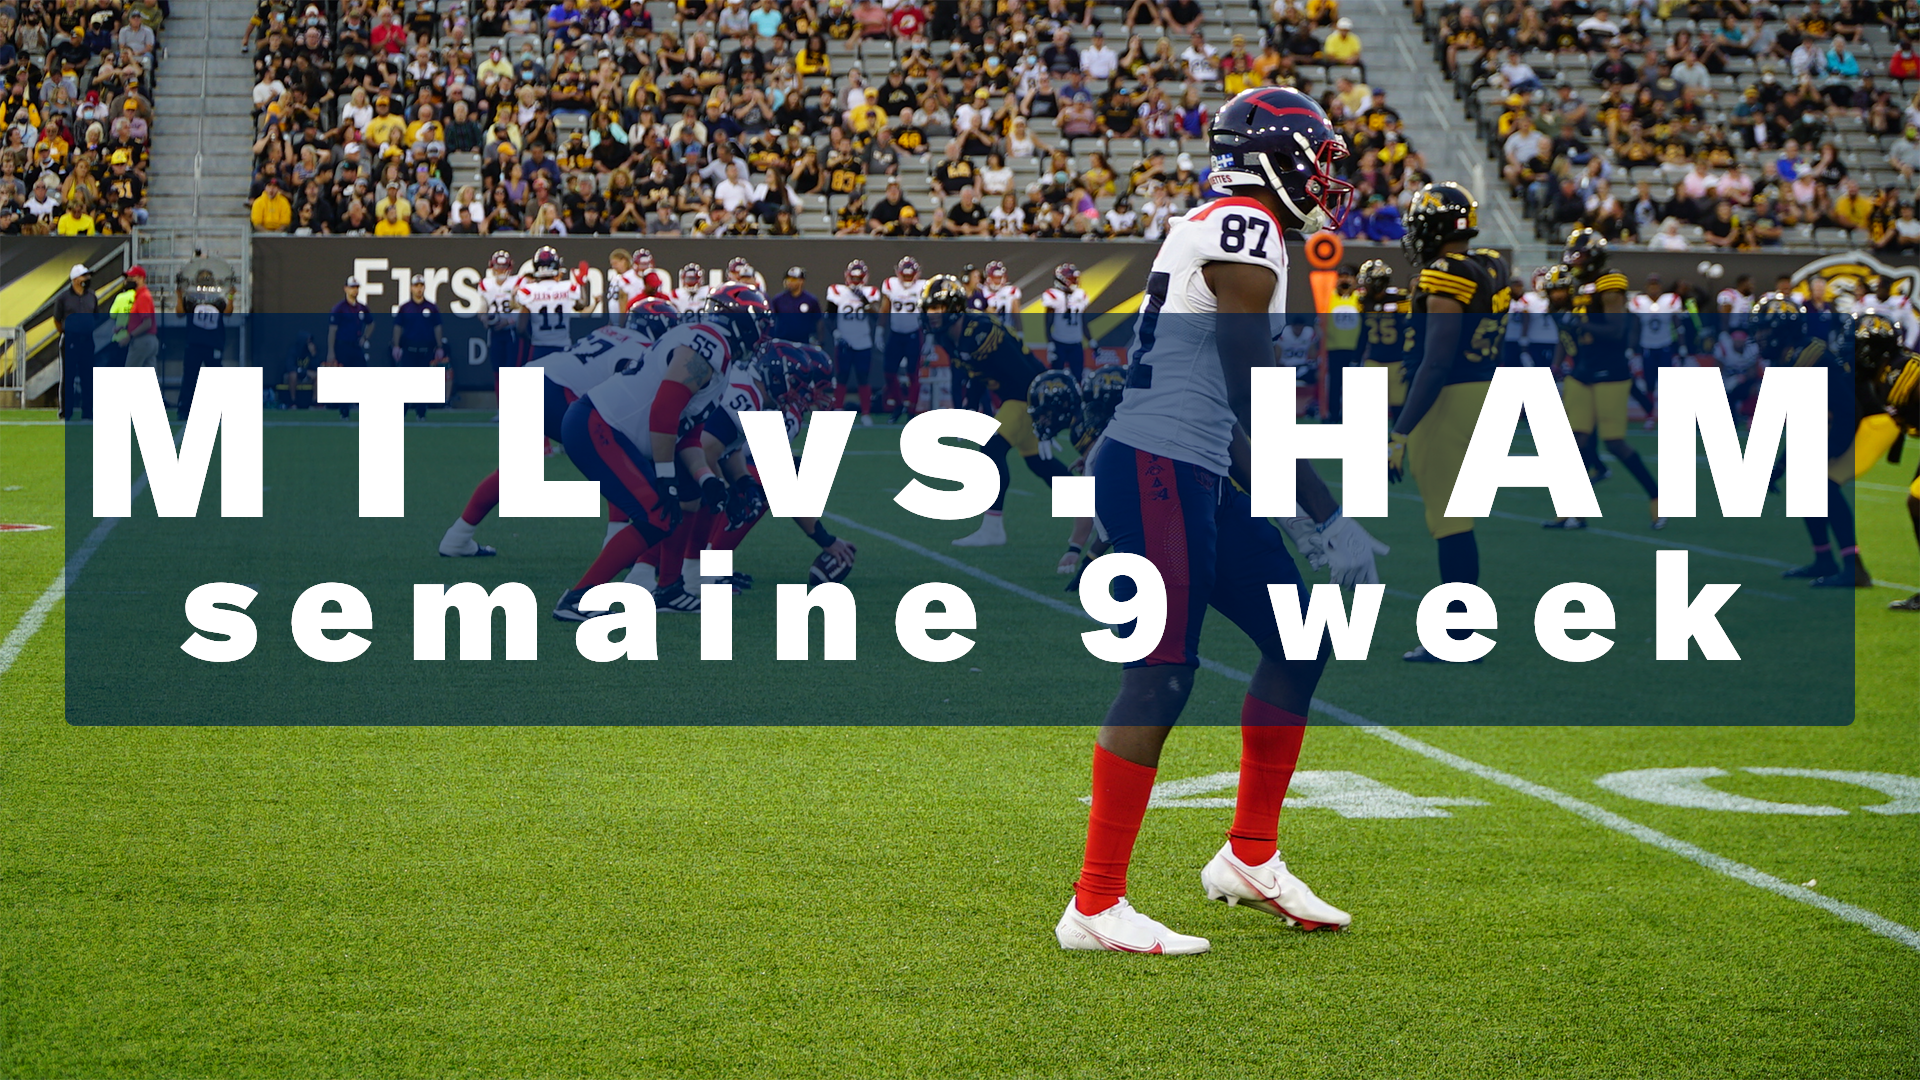 Recap of the victory in Hamilton – Week 9